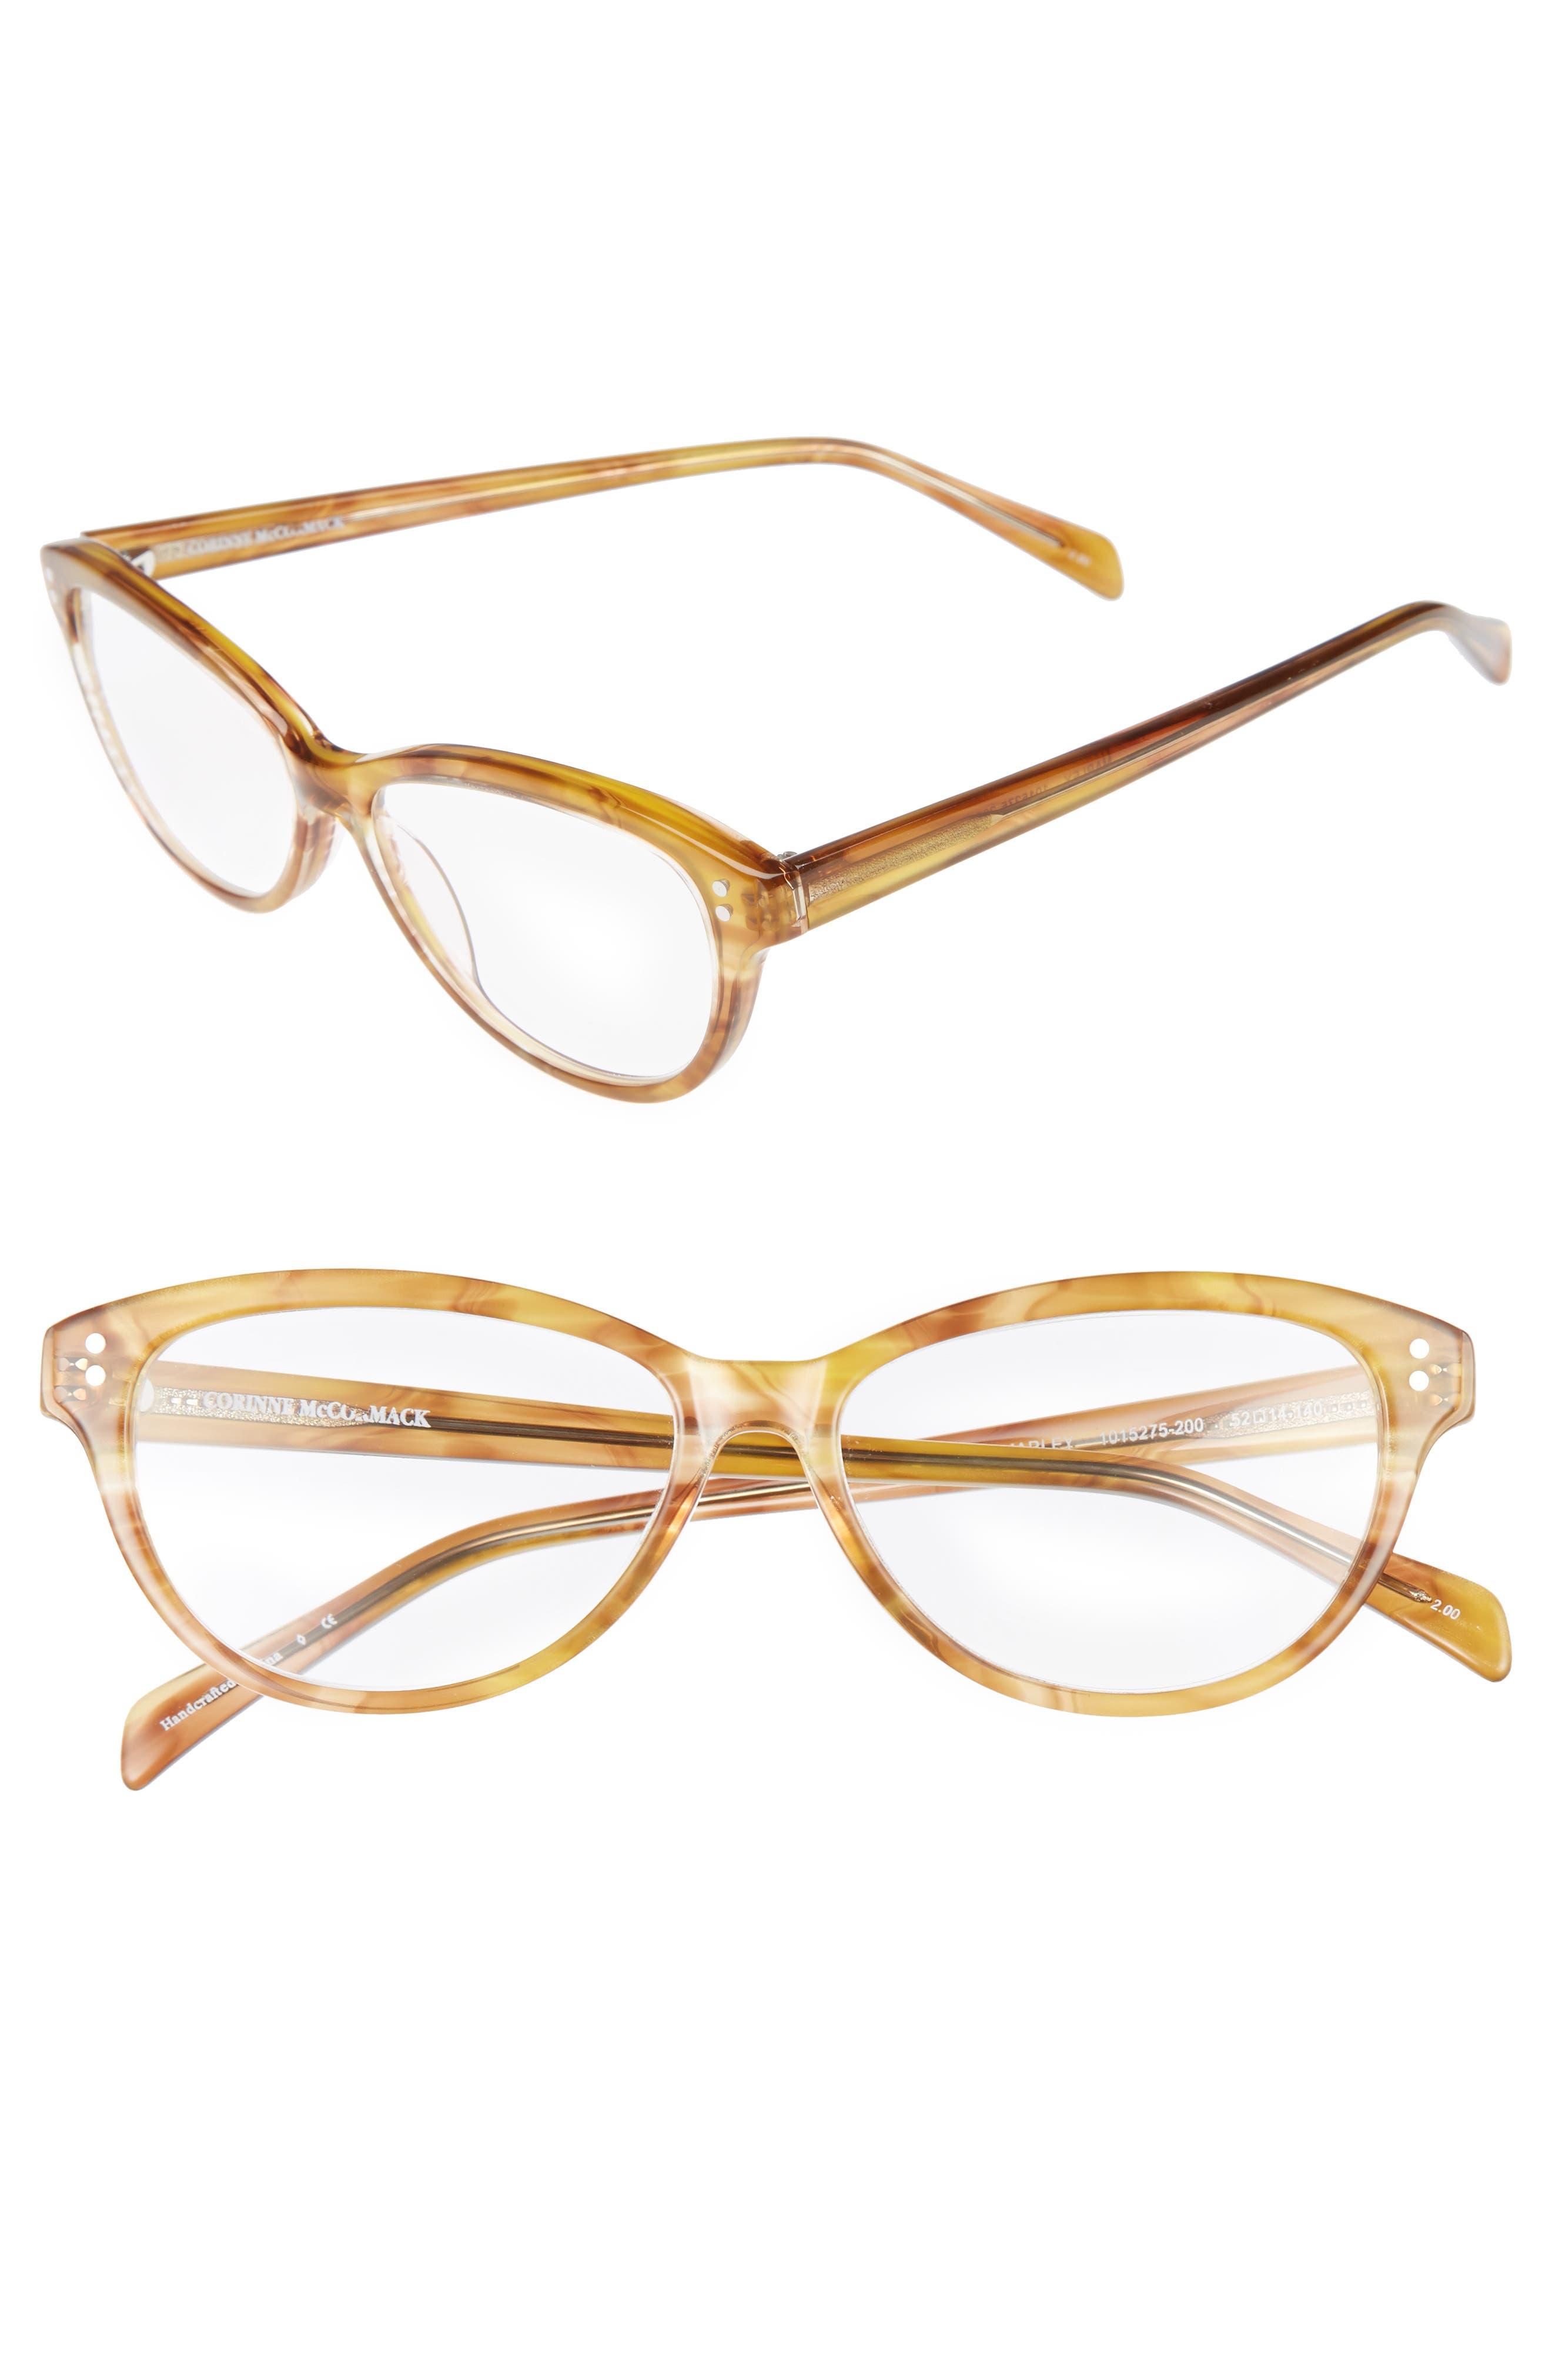 Main Image - Corinne McCormack Marley 52mm Reading Glasses